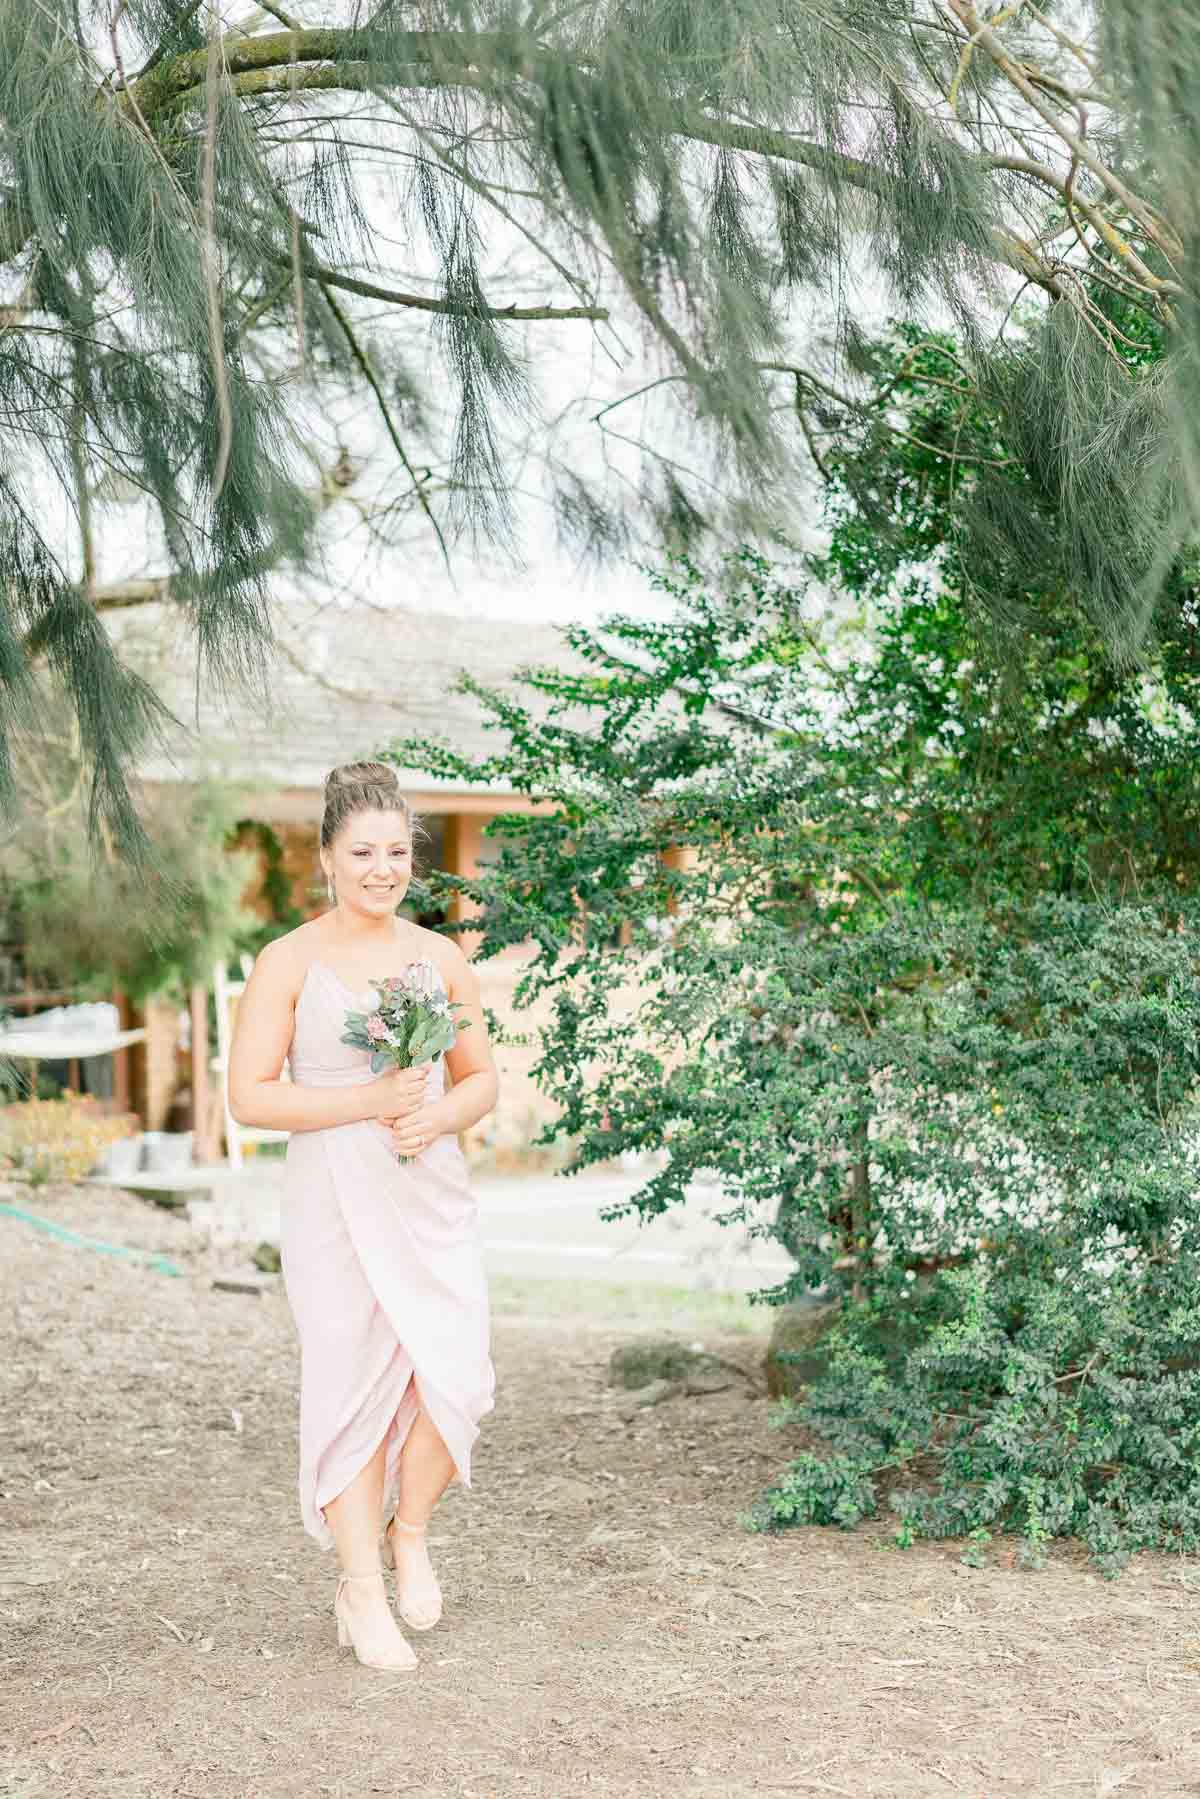 adams-farm-coldstream-yarra-valley-wedding-heart+soul-weddings-kel-jarryd-04784.jpg